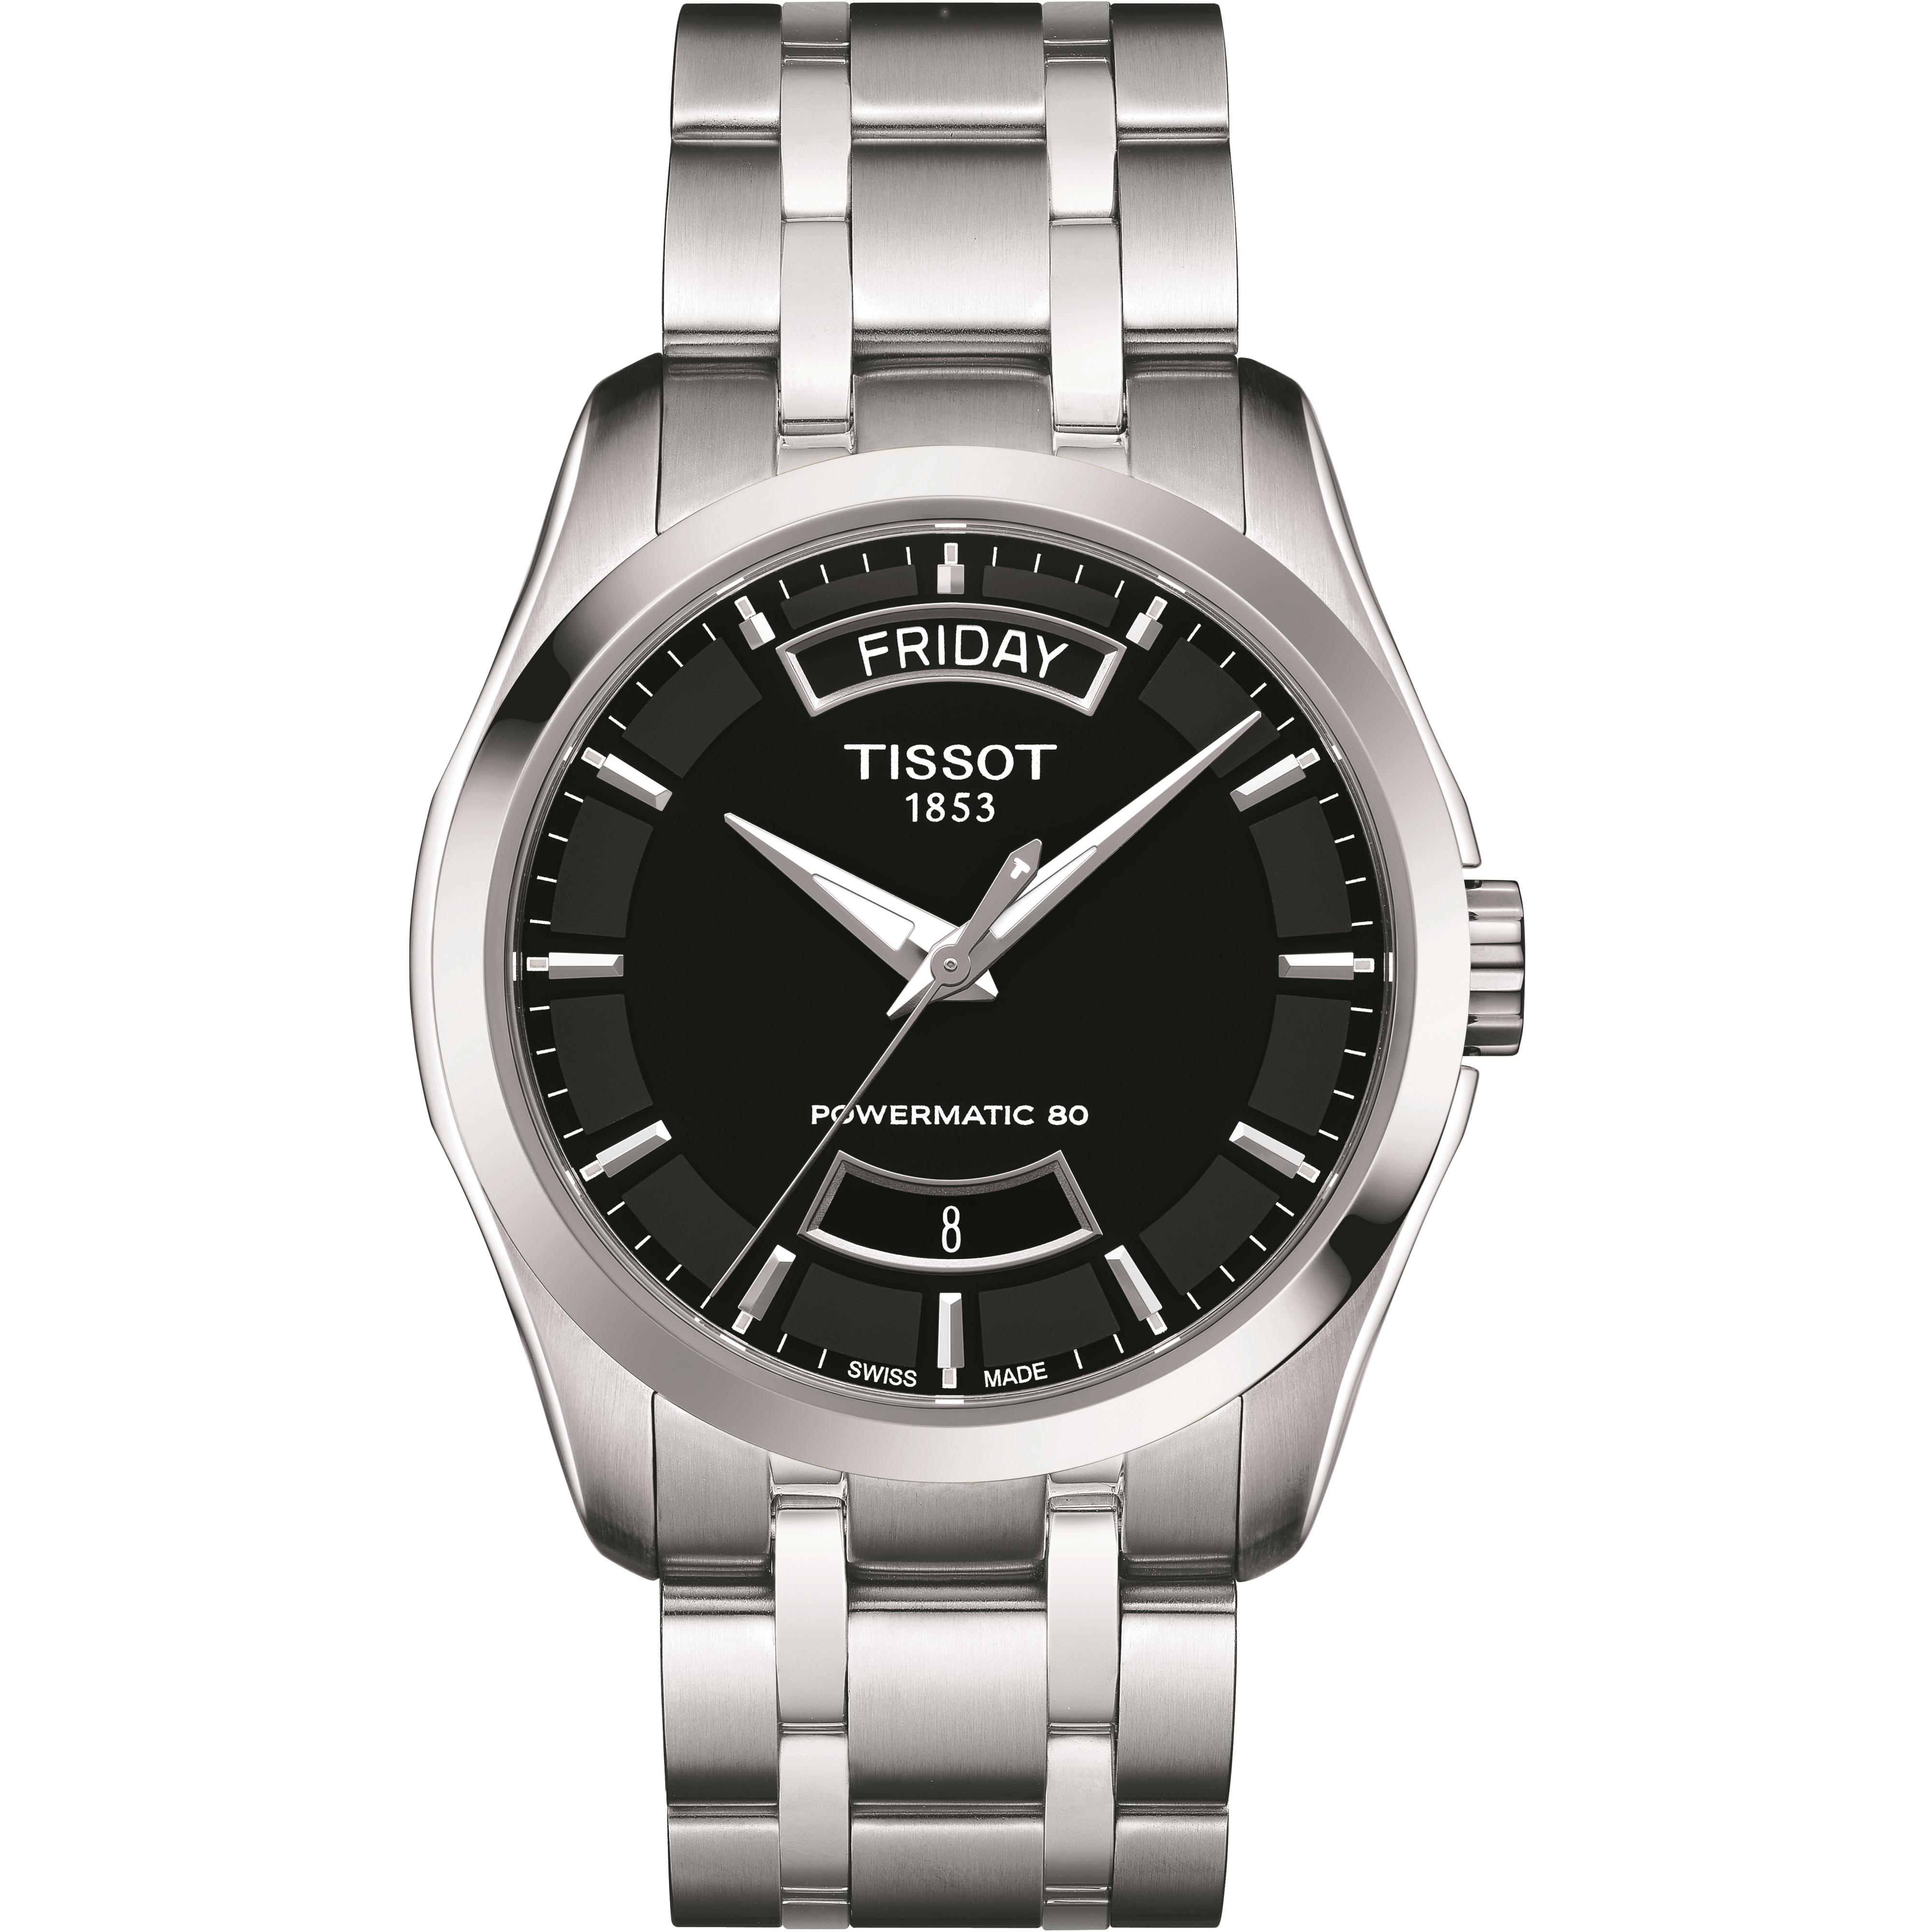 bdf8e8f50 Gents Tissot Couturier Powermatic 80 Watch (T0354071105101) | WatchShop.com™